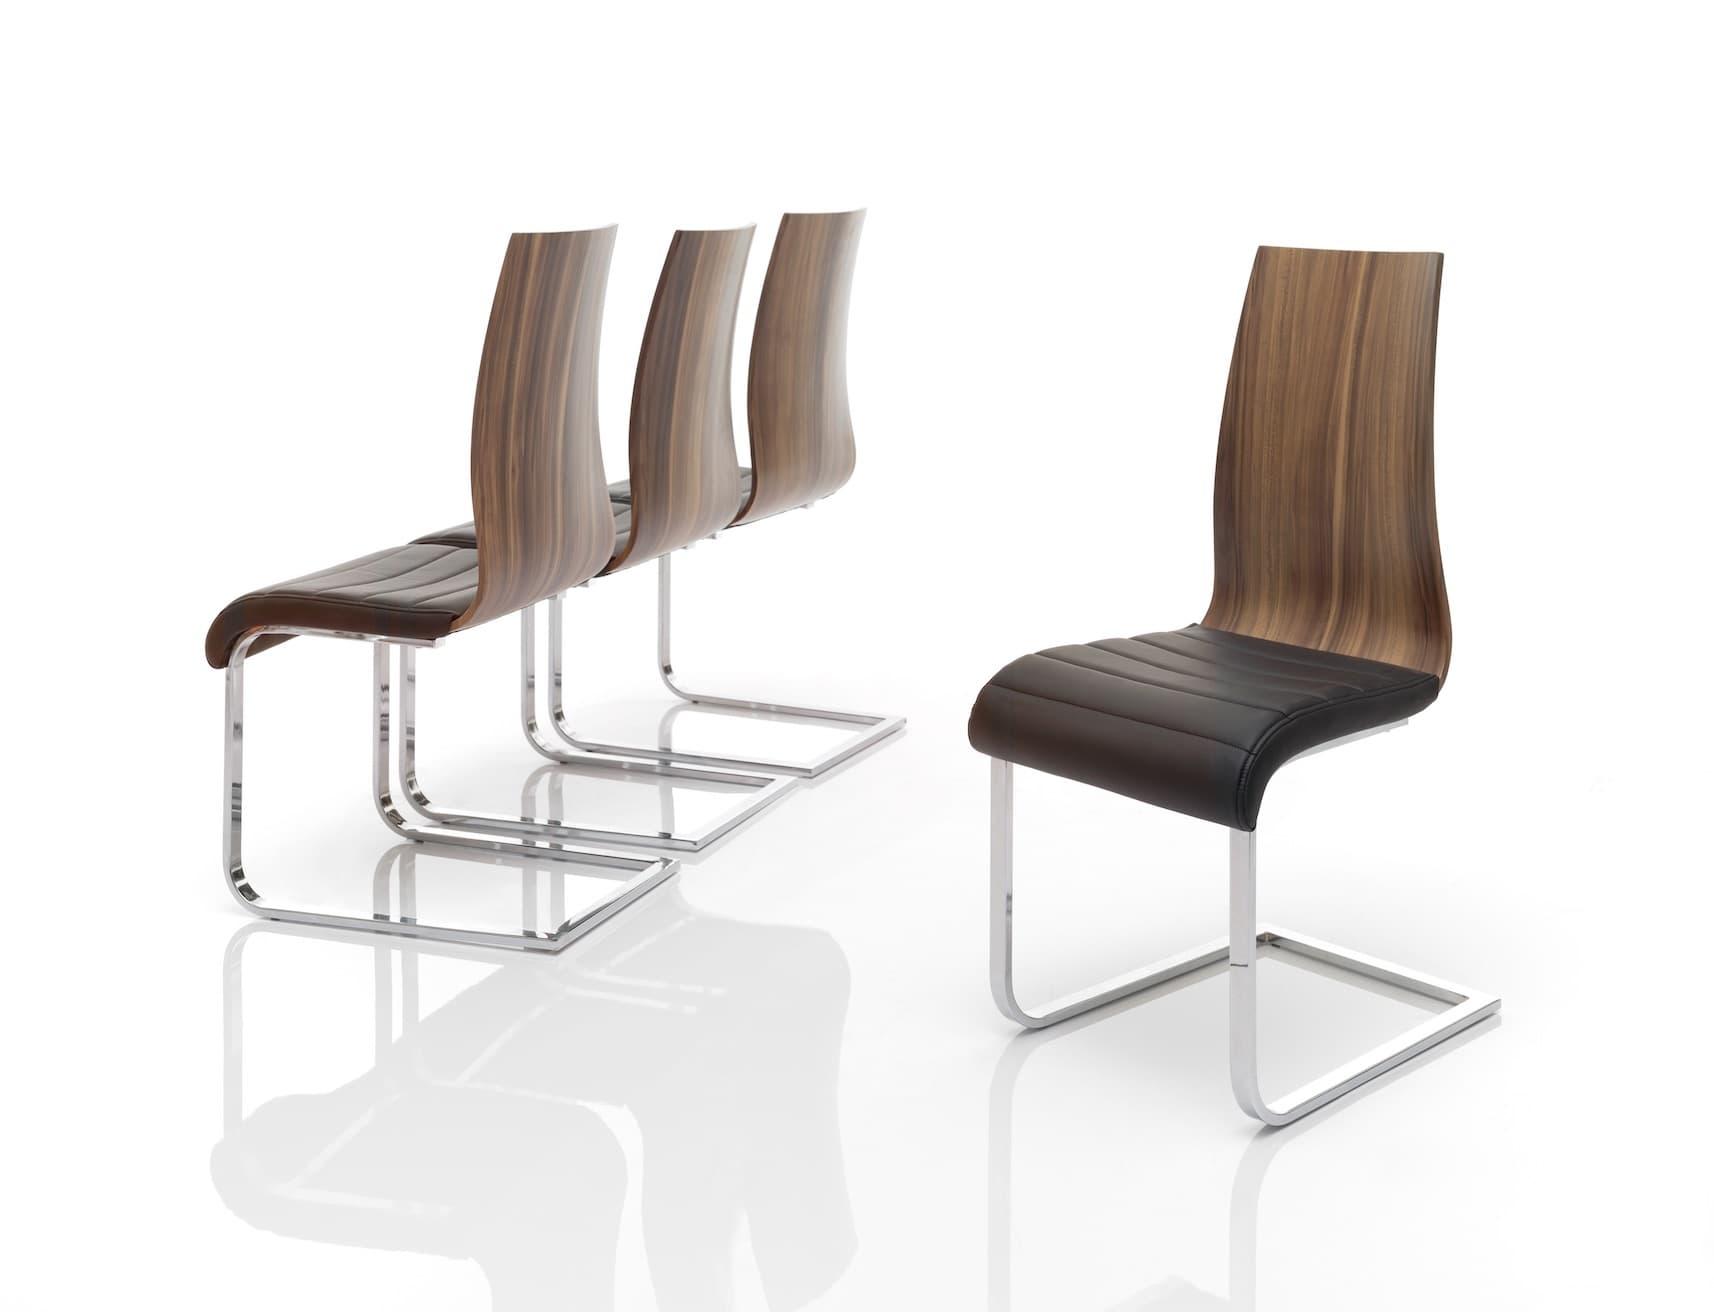 30 luxe chaise en rotin pas cher hiw6 armoires de cuisine for Chaise de salle a manger en rotin pas cher